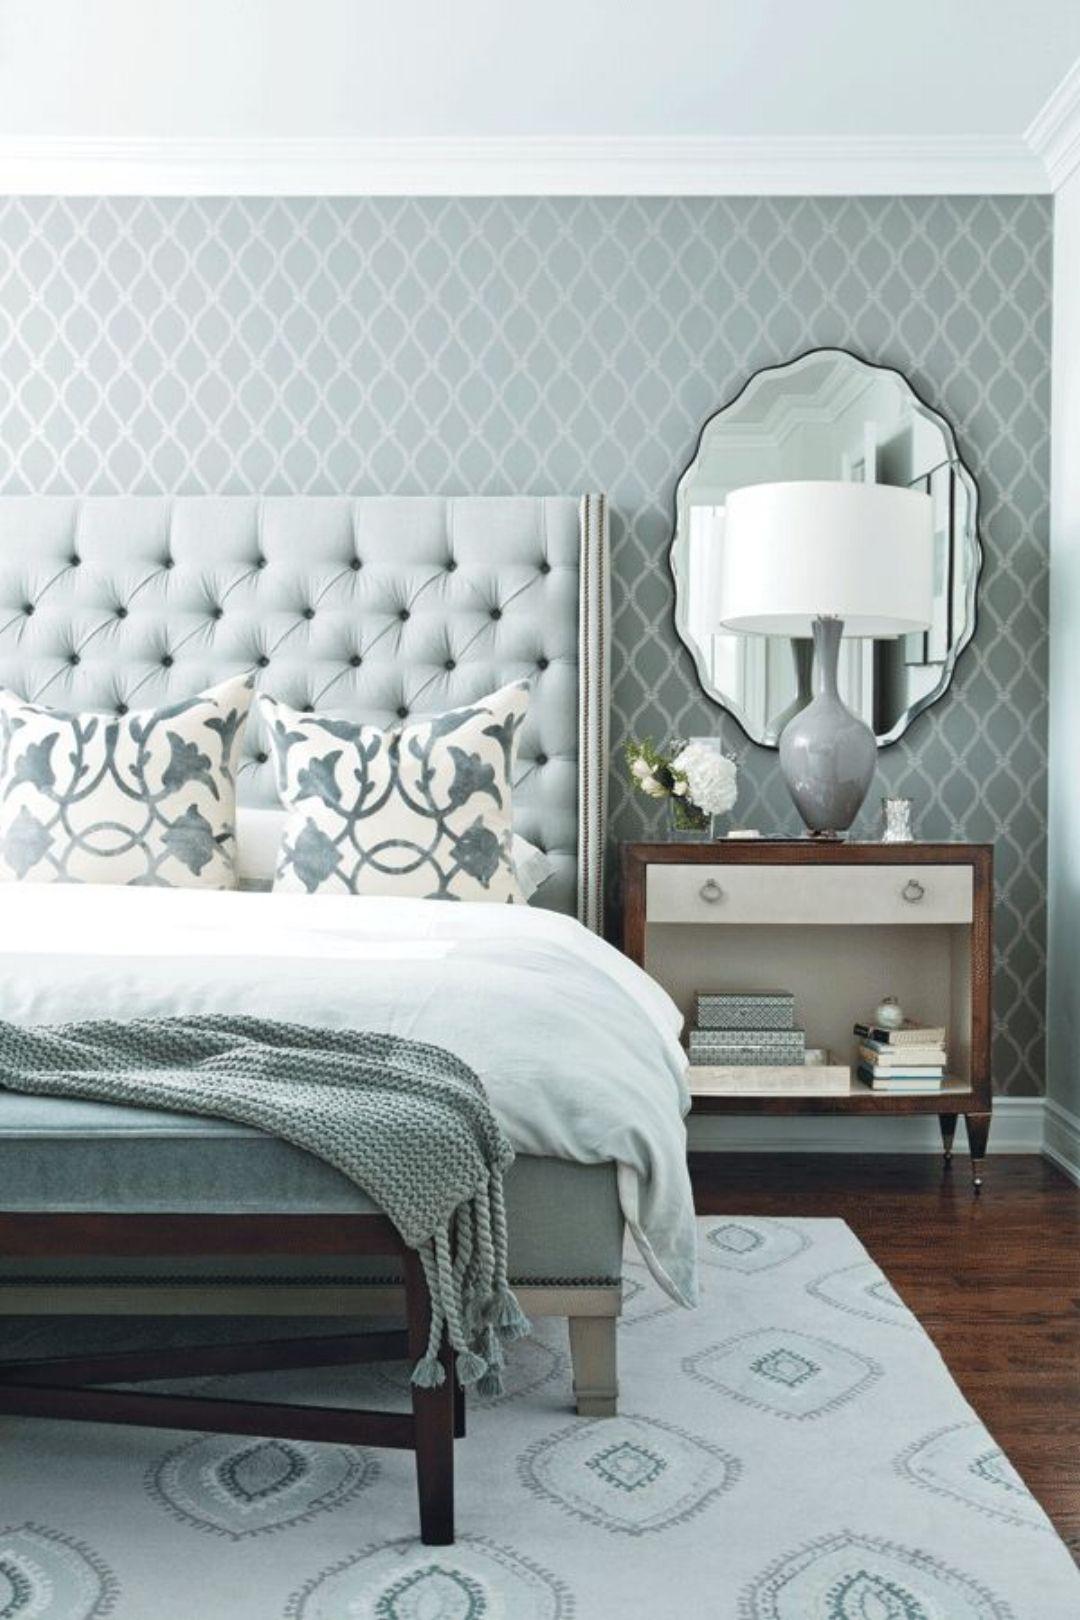 Beautiful Master Bedroom Designs Part - 45: 60 Classic Master Bedrooms ?. Master Bedroom DesignBedroom DesignsBeautiful  ...